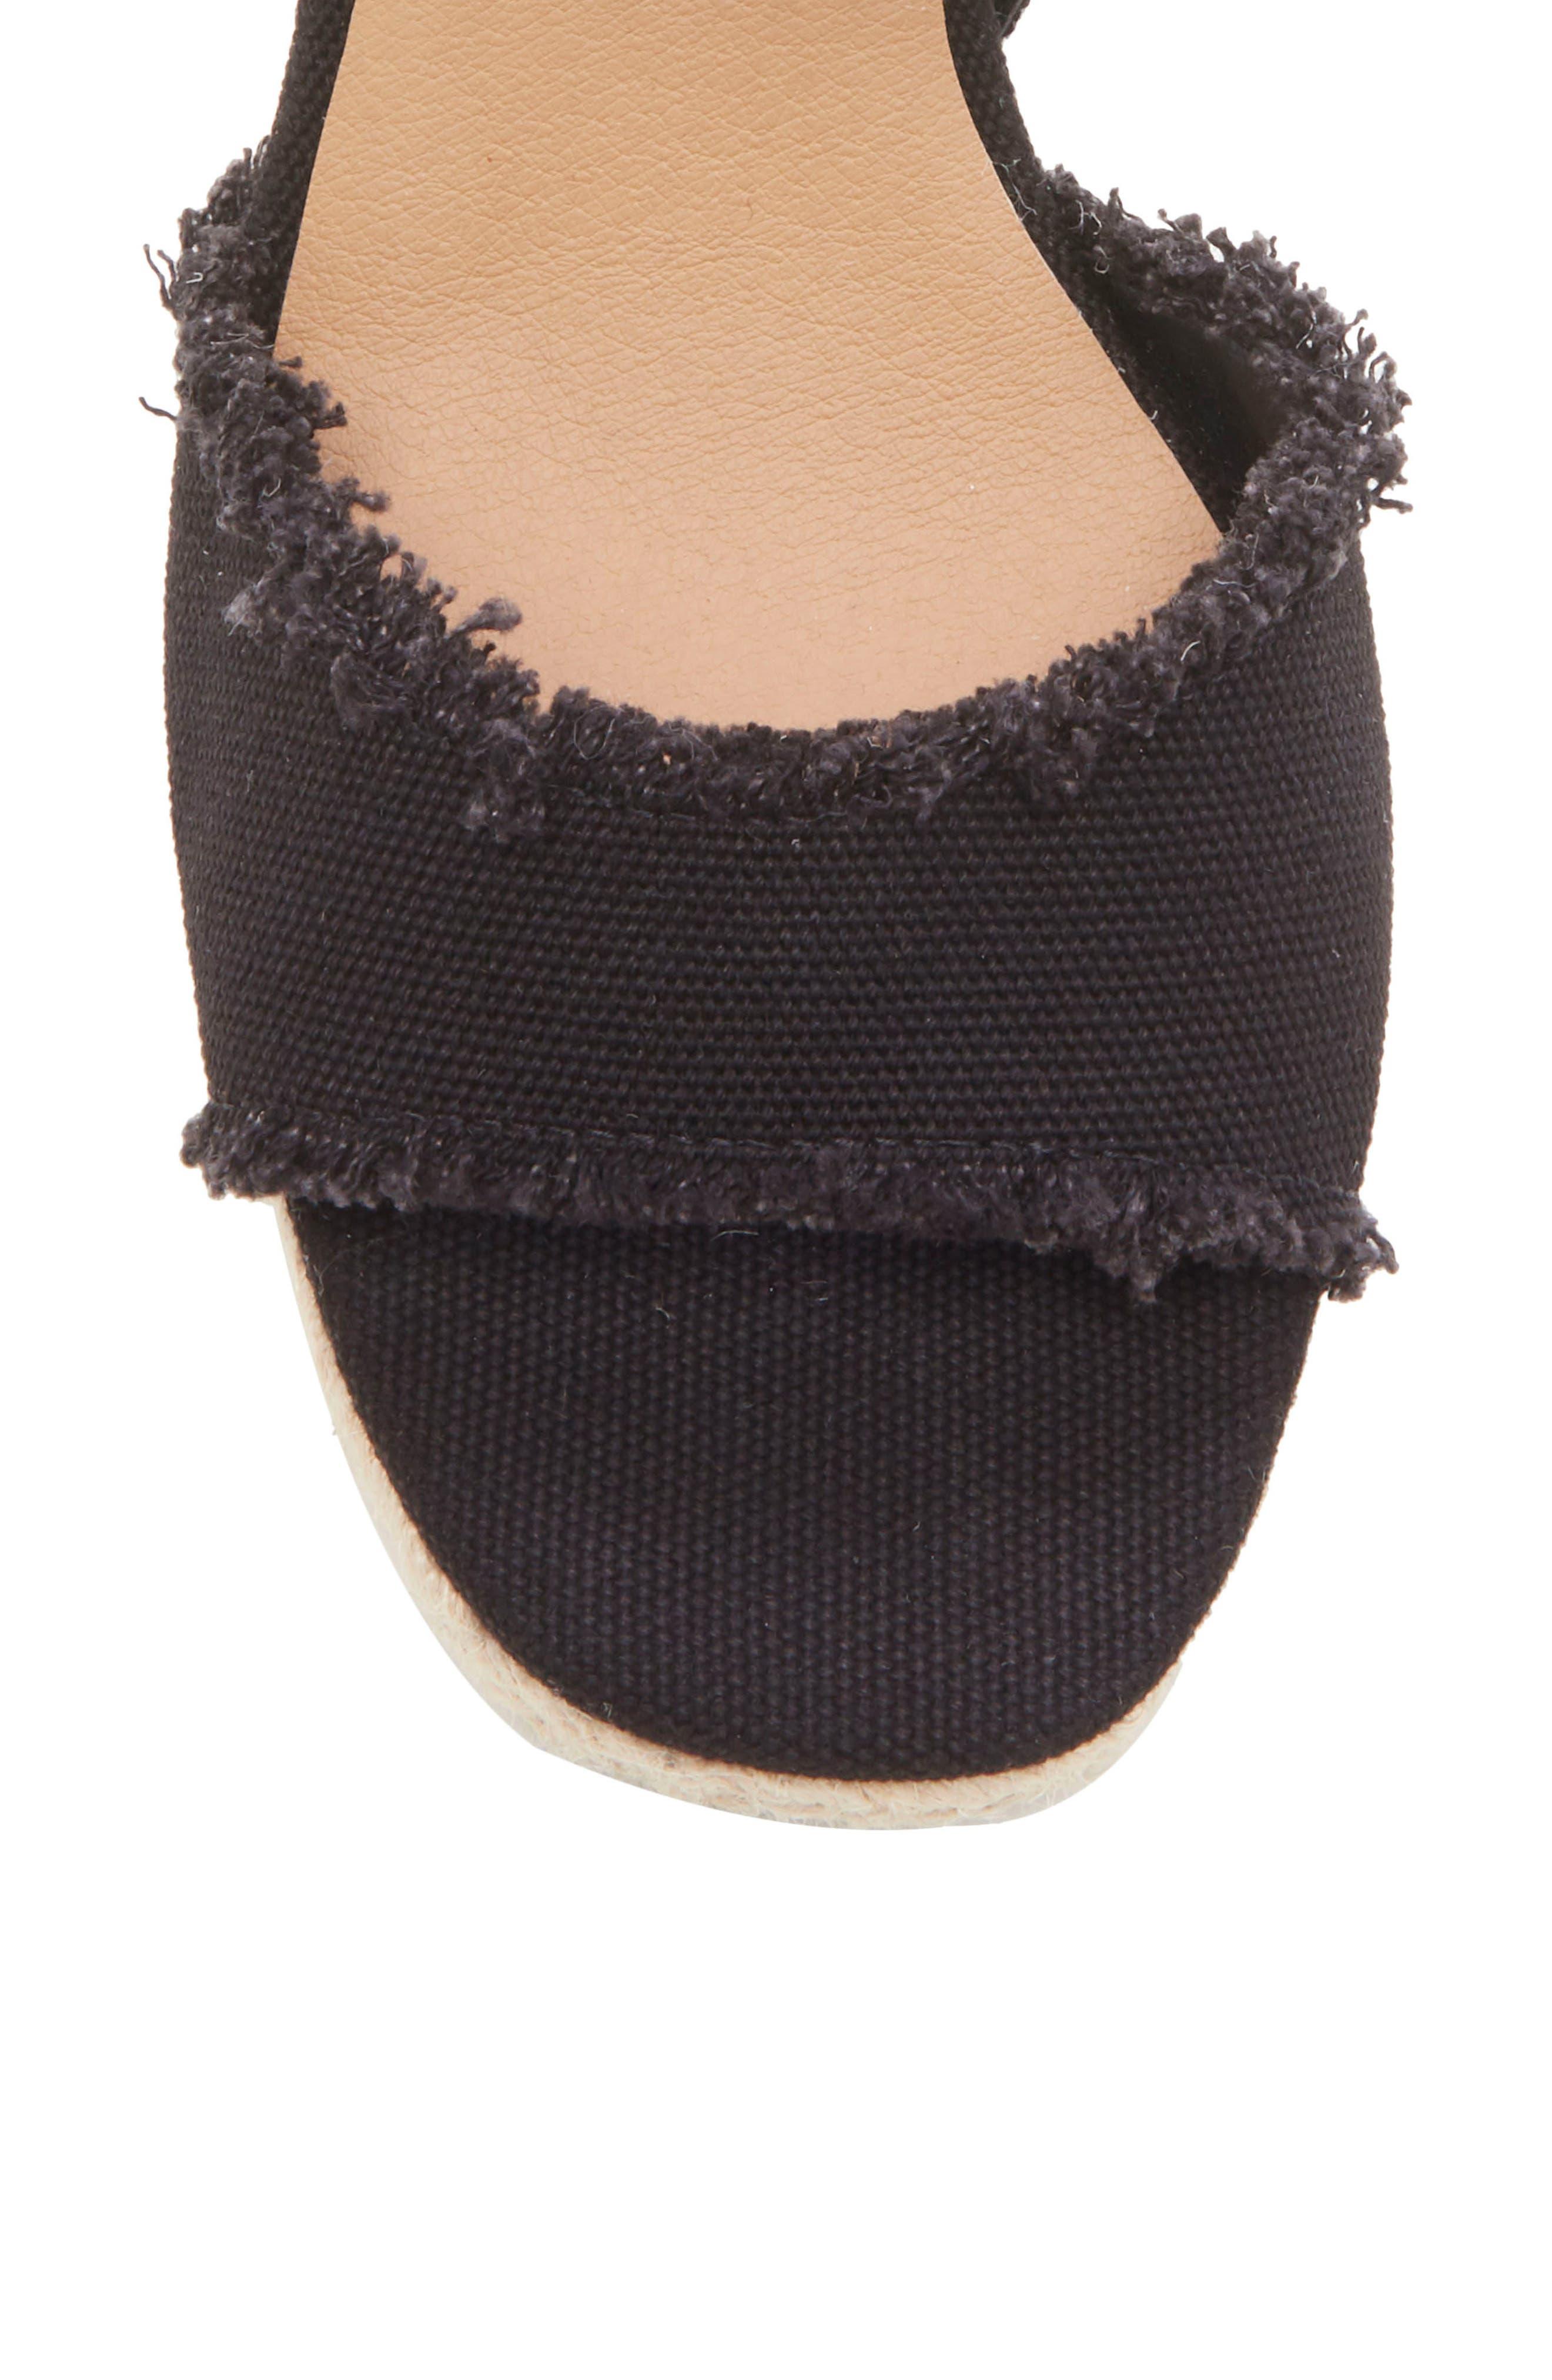 LUCKY BRAND,                             Mindra Espadrille Wedge Sandal,                             Alternate thumbnail 8, color,                             BLACK FABRIC